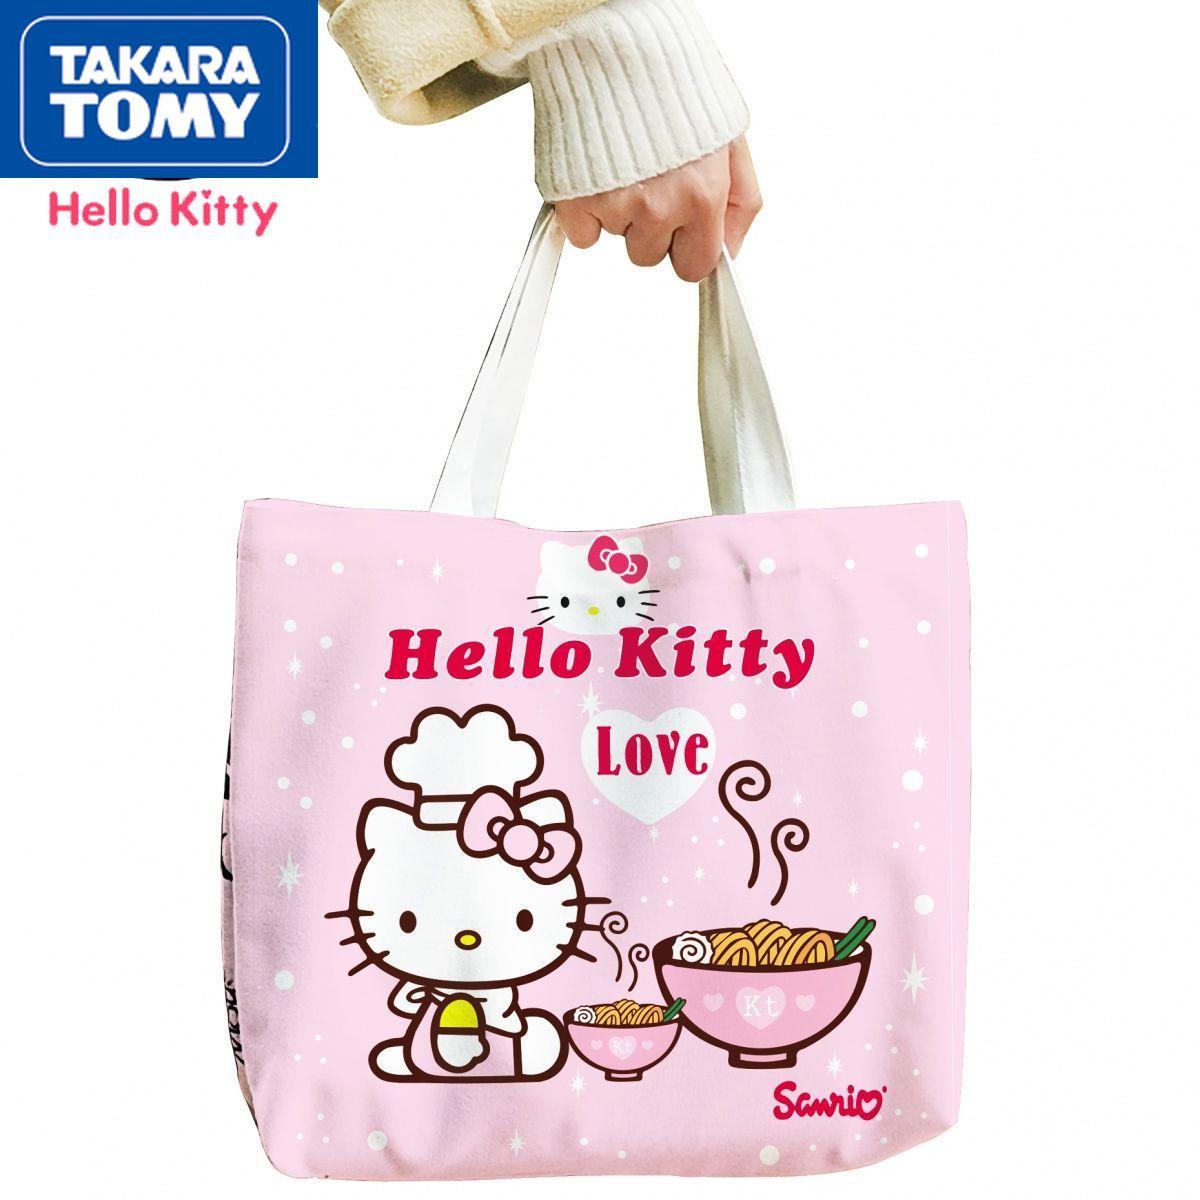 printio сумка hello kitty TAKARA TOMY симпатичная мультяшная Hello Kitty вместительная Холщовая Сумка на одно плечо простая Женская милая и свежая Повседневная сумка